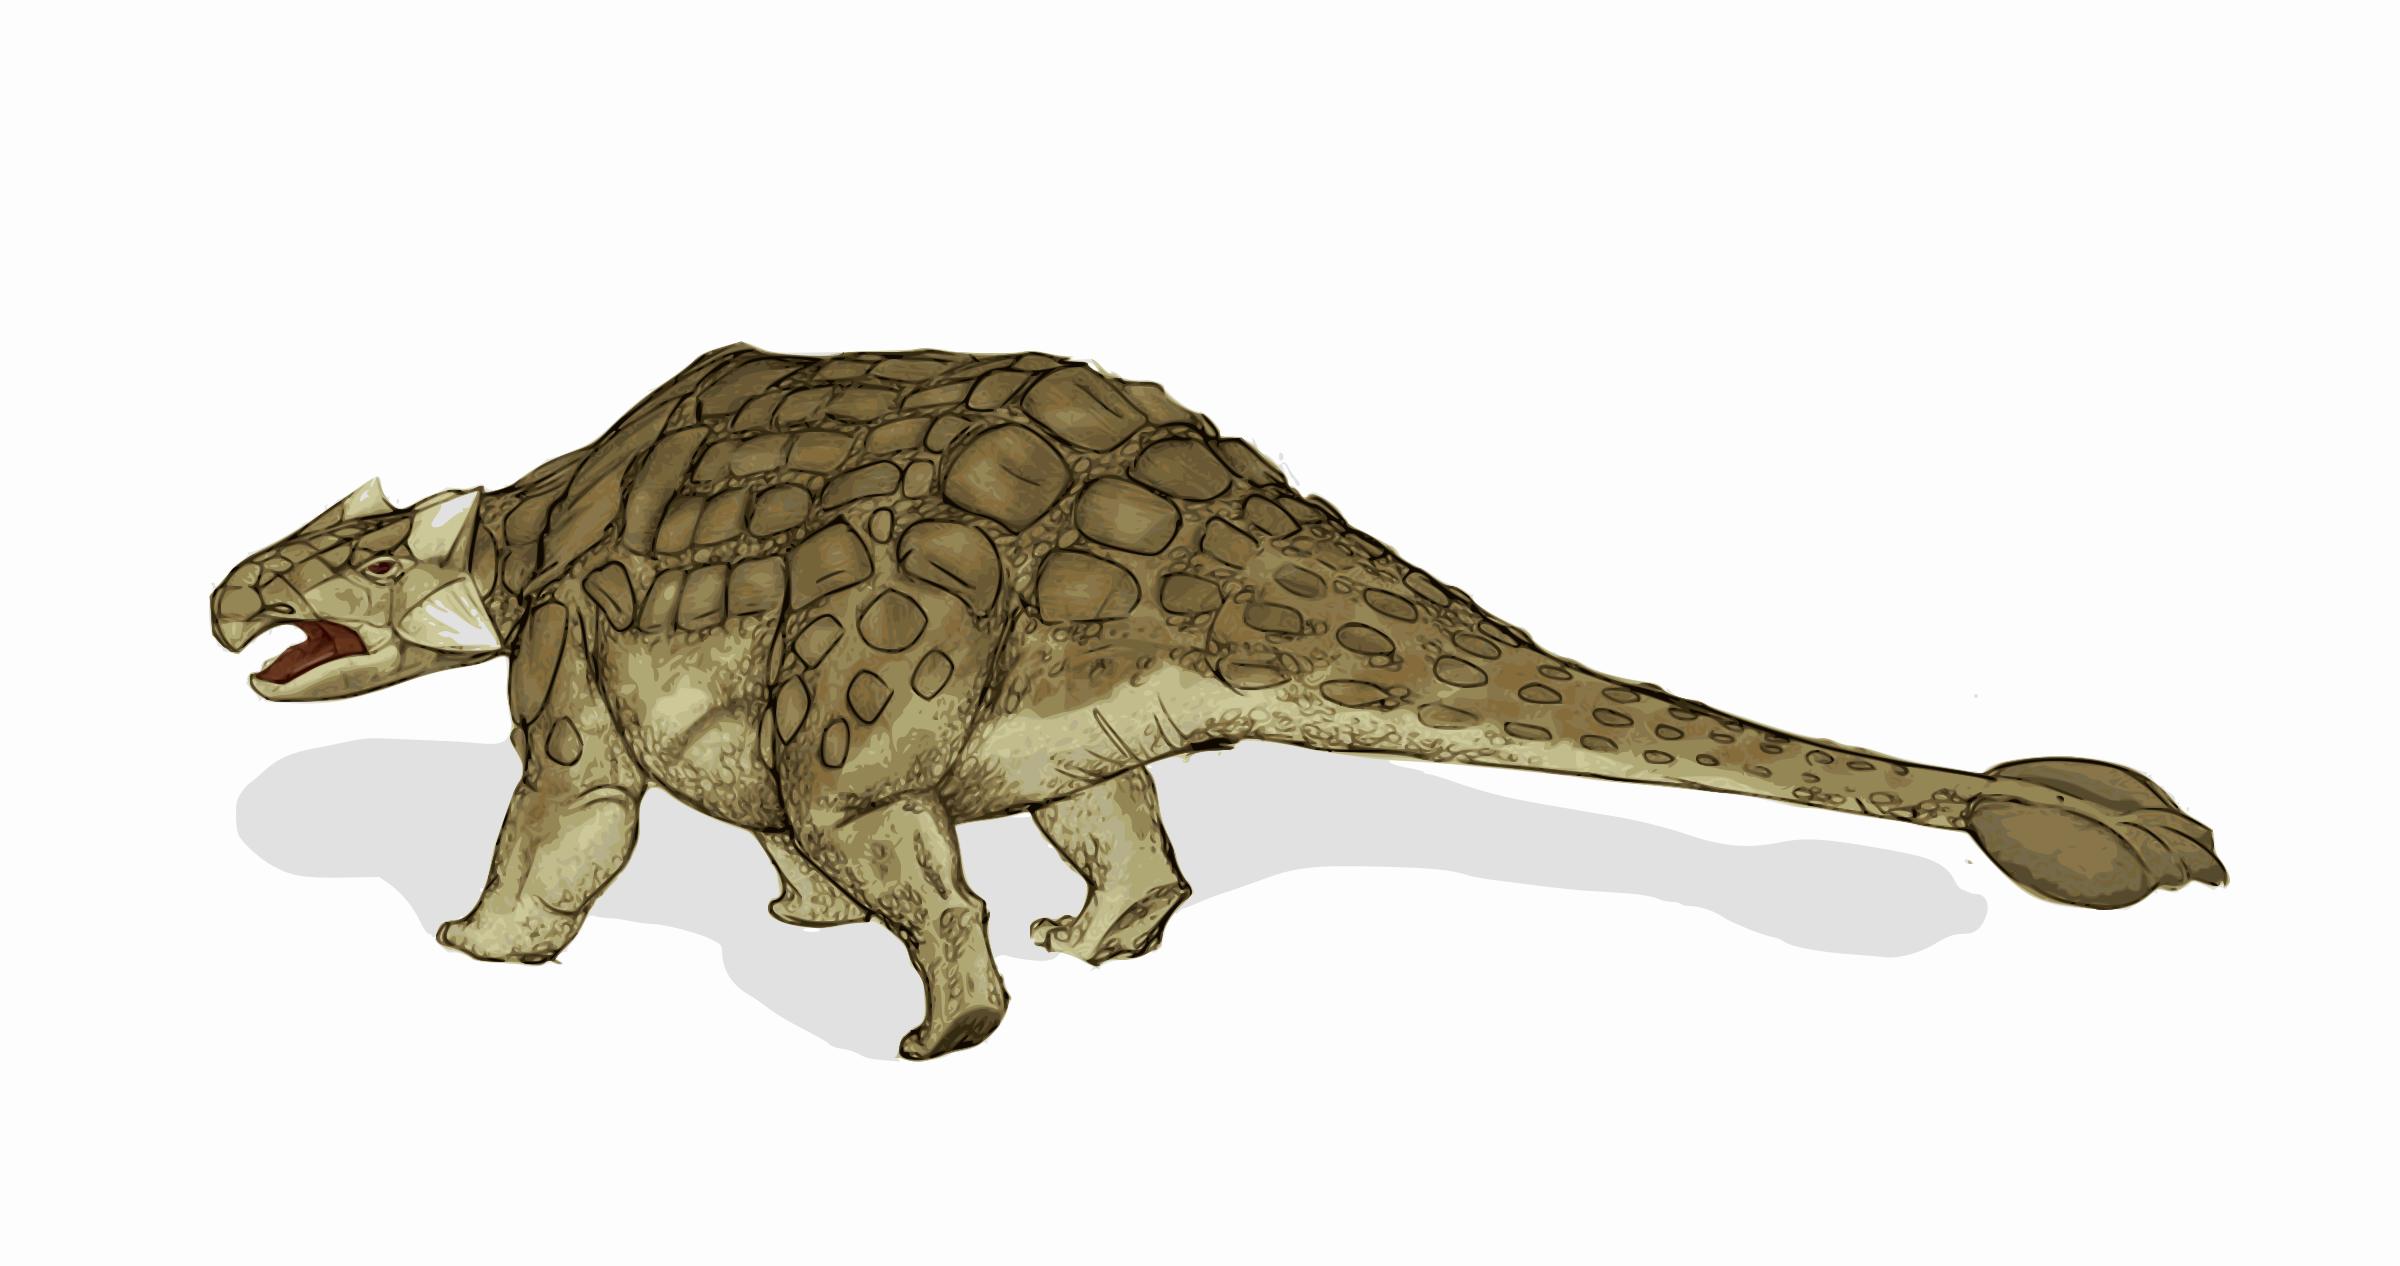 Ankylosaurus Free Vector Clipart image.